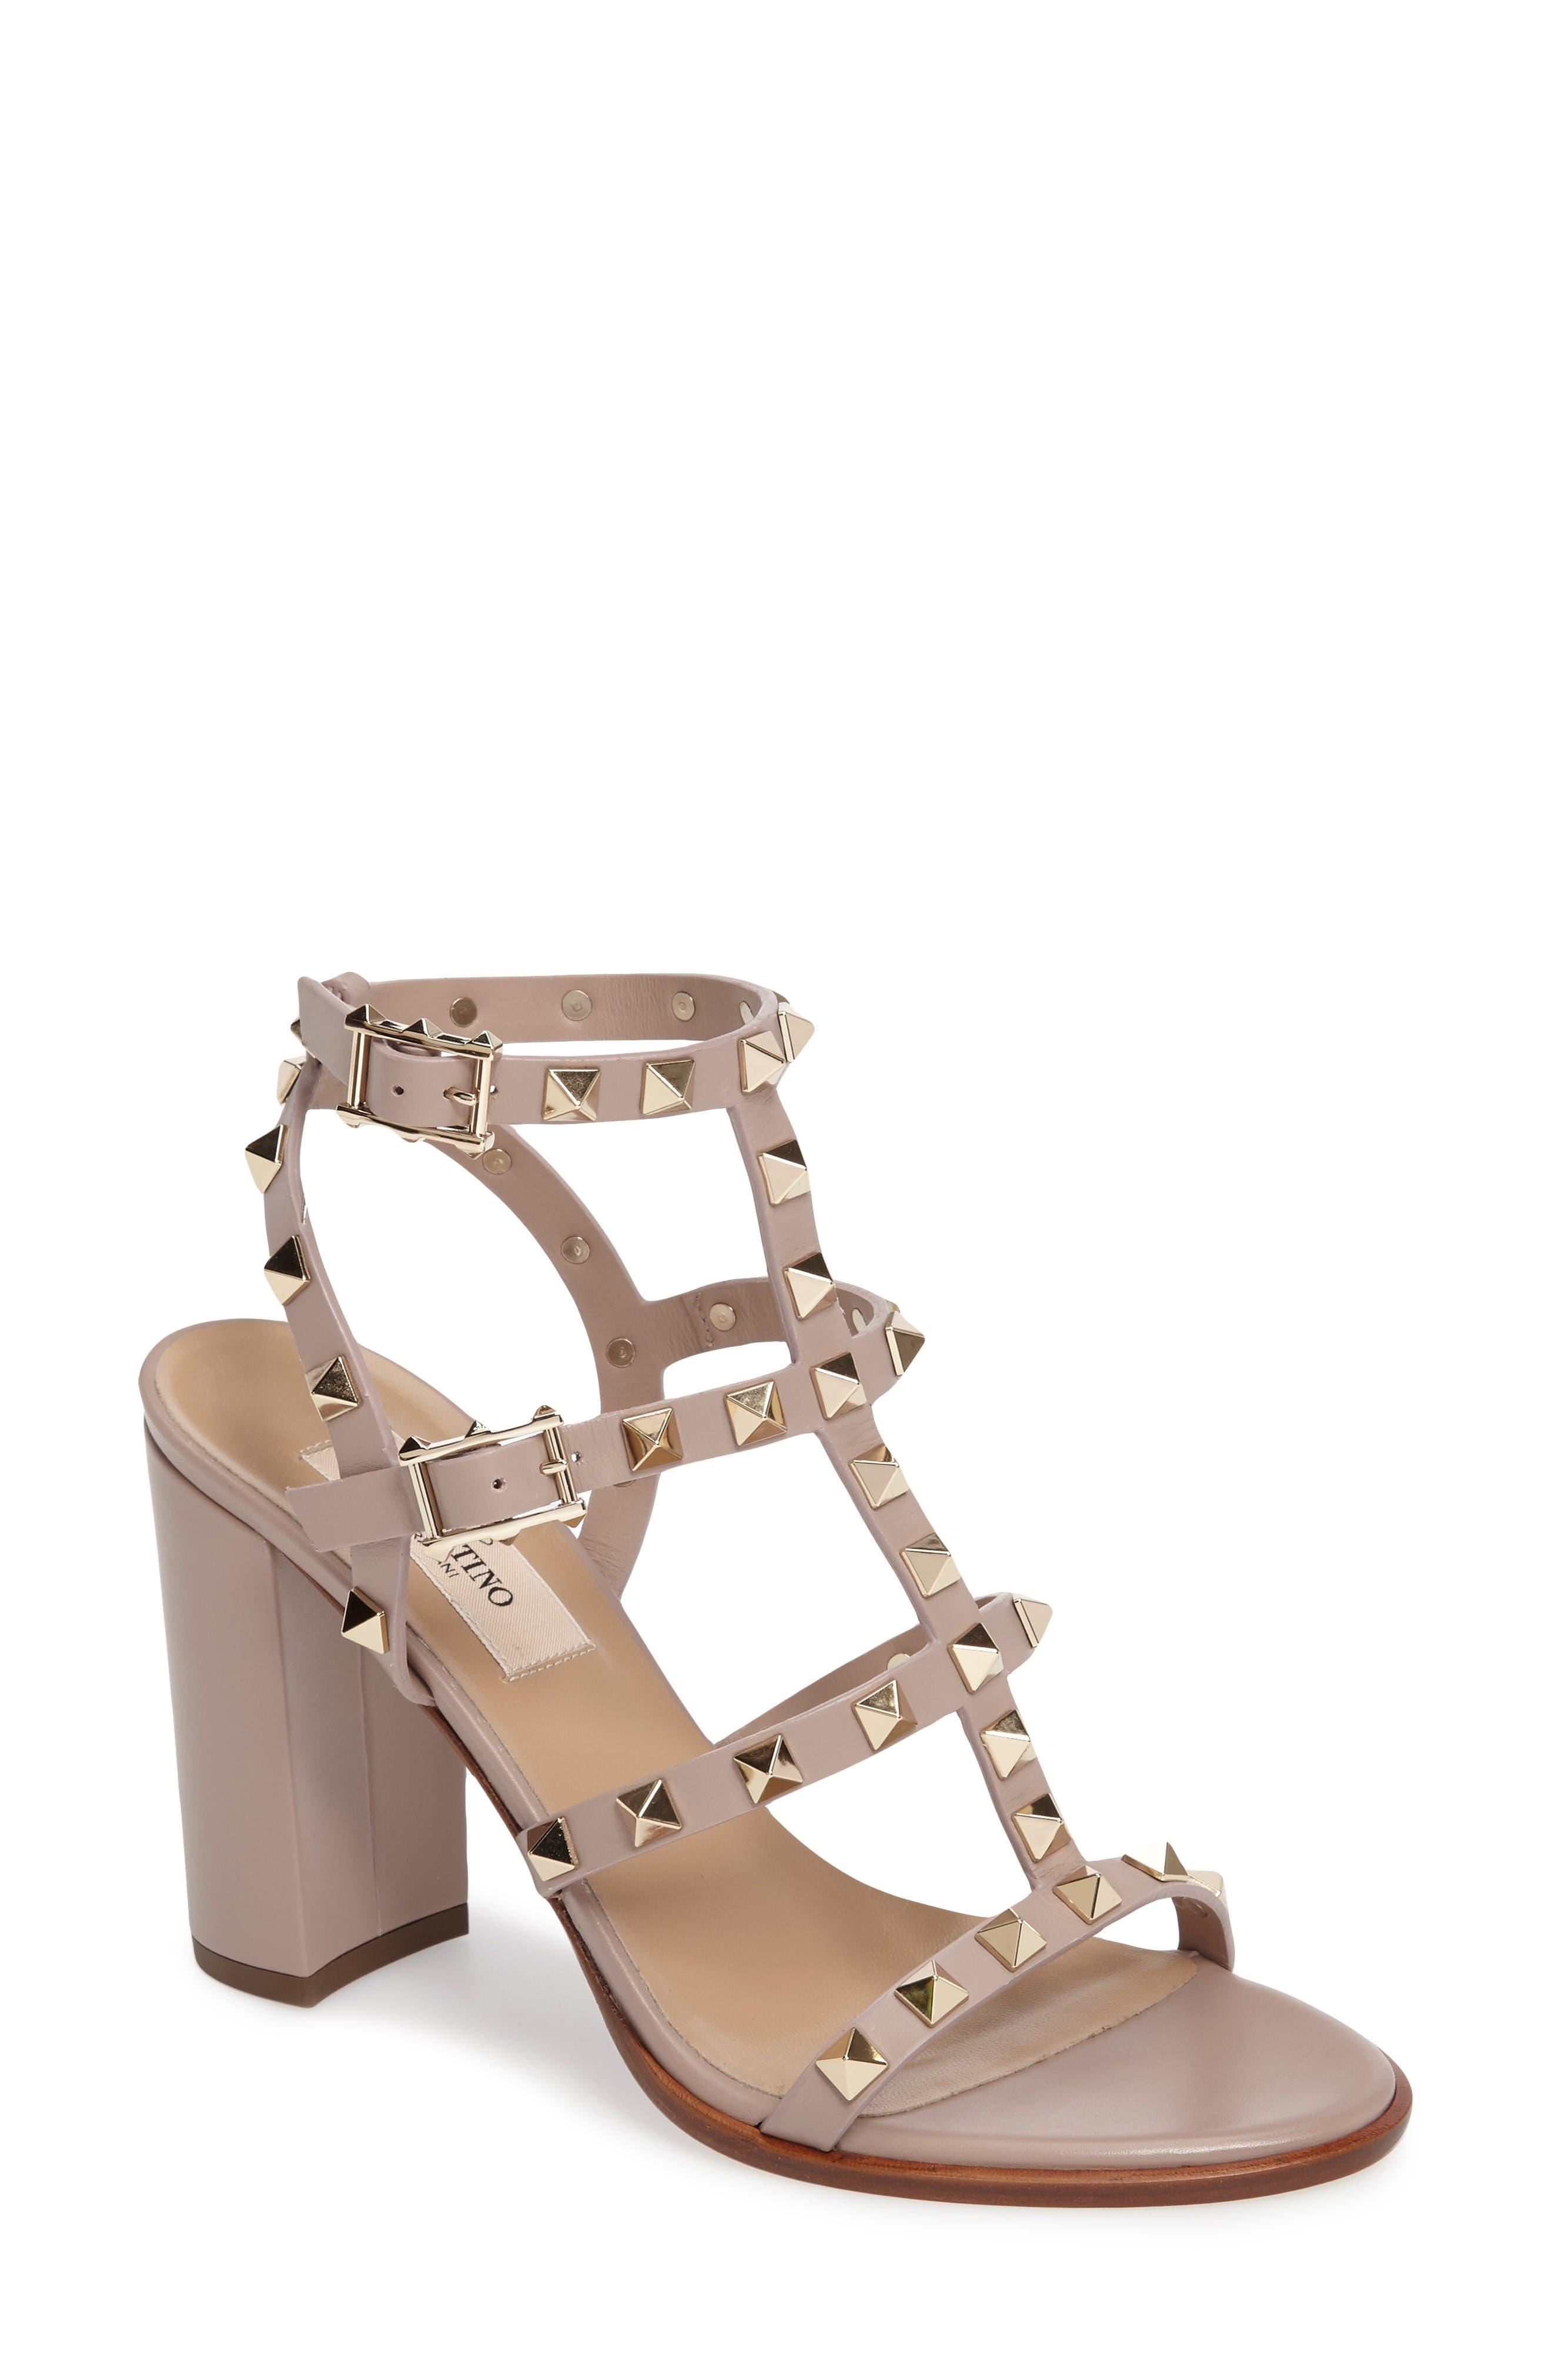 Alternate Image 1 Selected - VALENTINO GARAVANI 'Rockstud' T-Strap Sandal (Women)